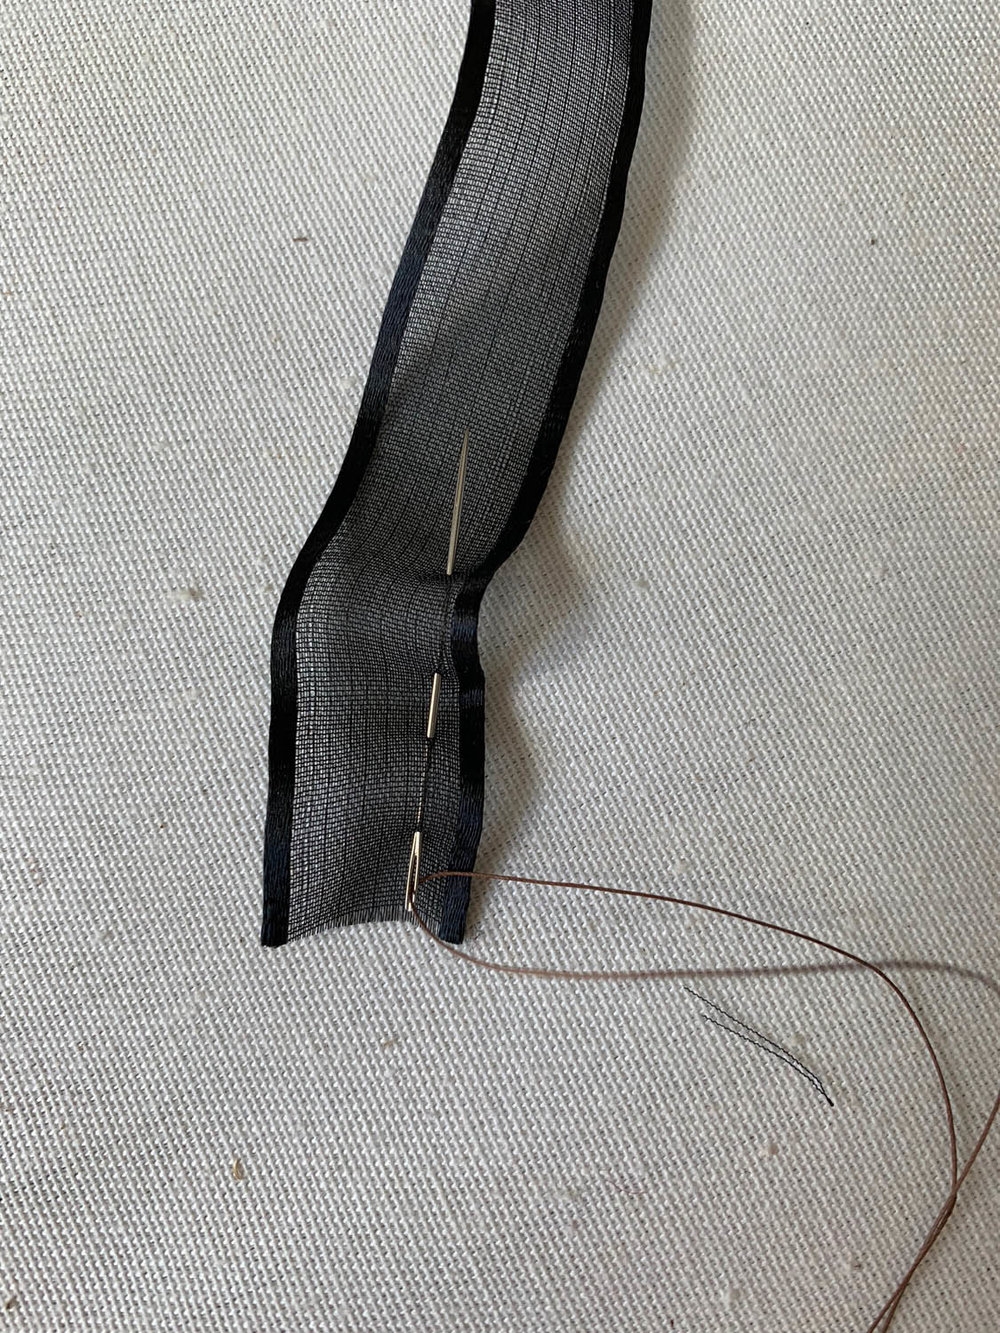 gathering black silk ribbon edge with needle and thread